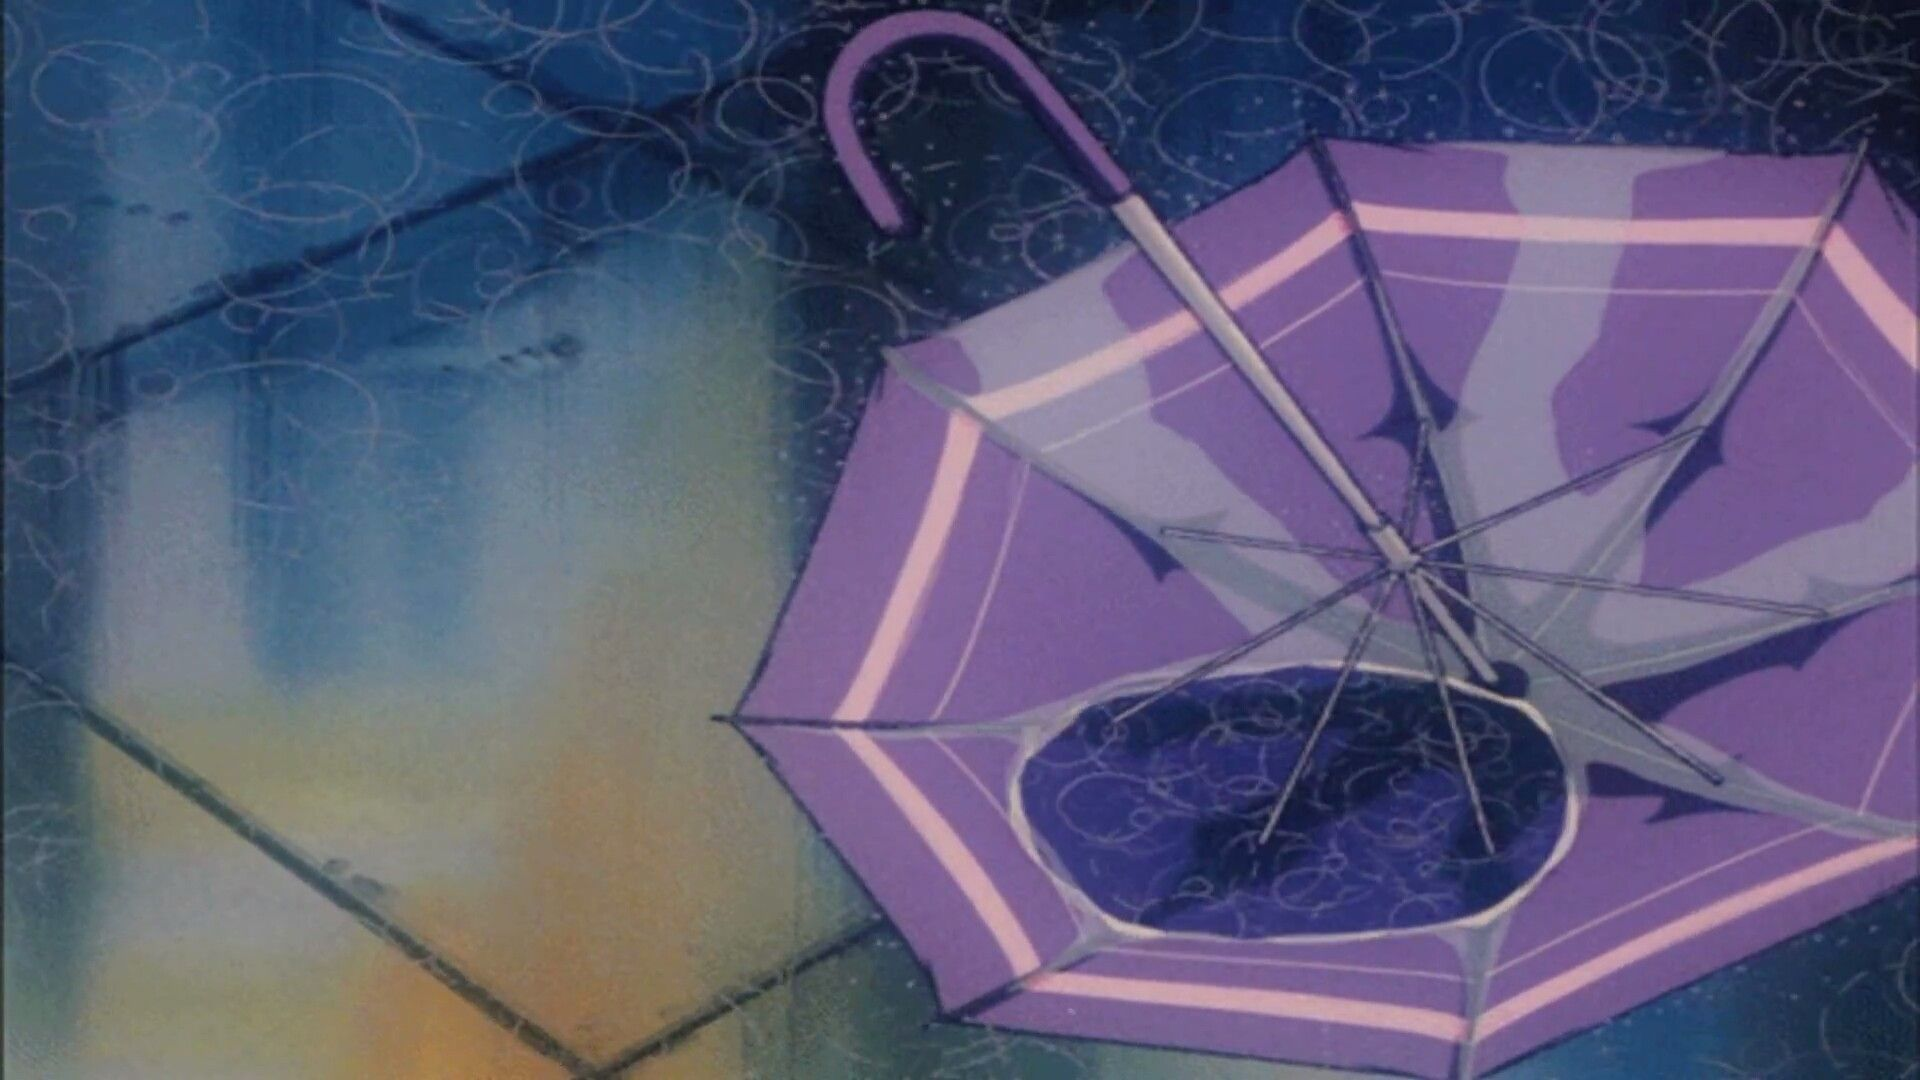 Umbrella In 2020 Aesthetic Anime Anime Wallpaper Anime Wallpaper Iphone